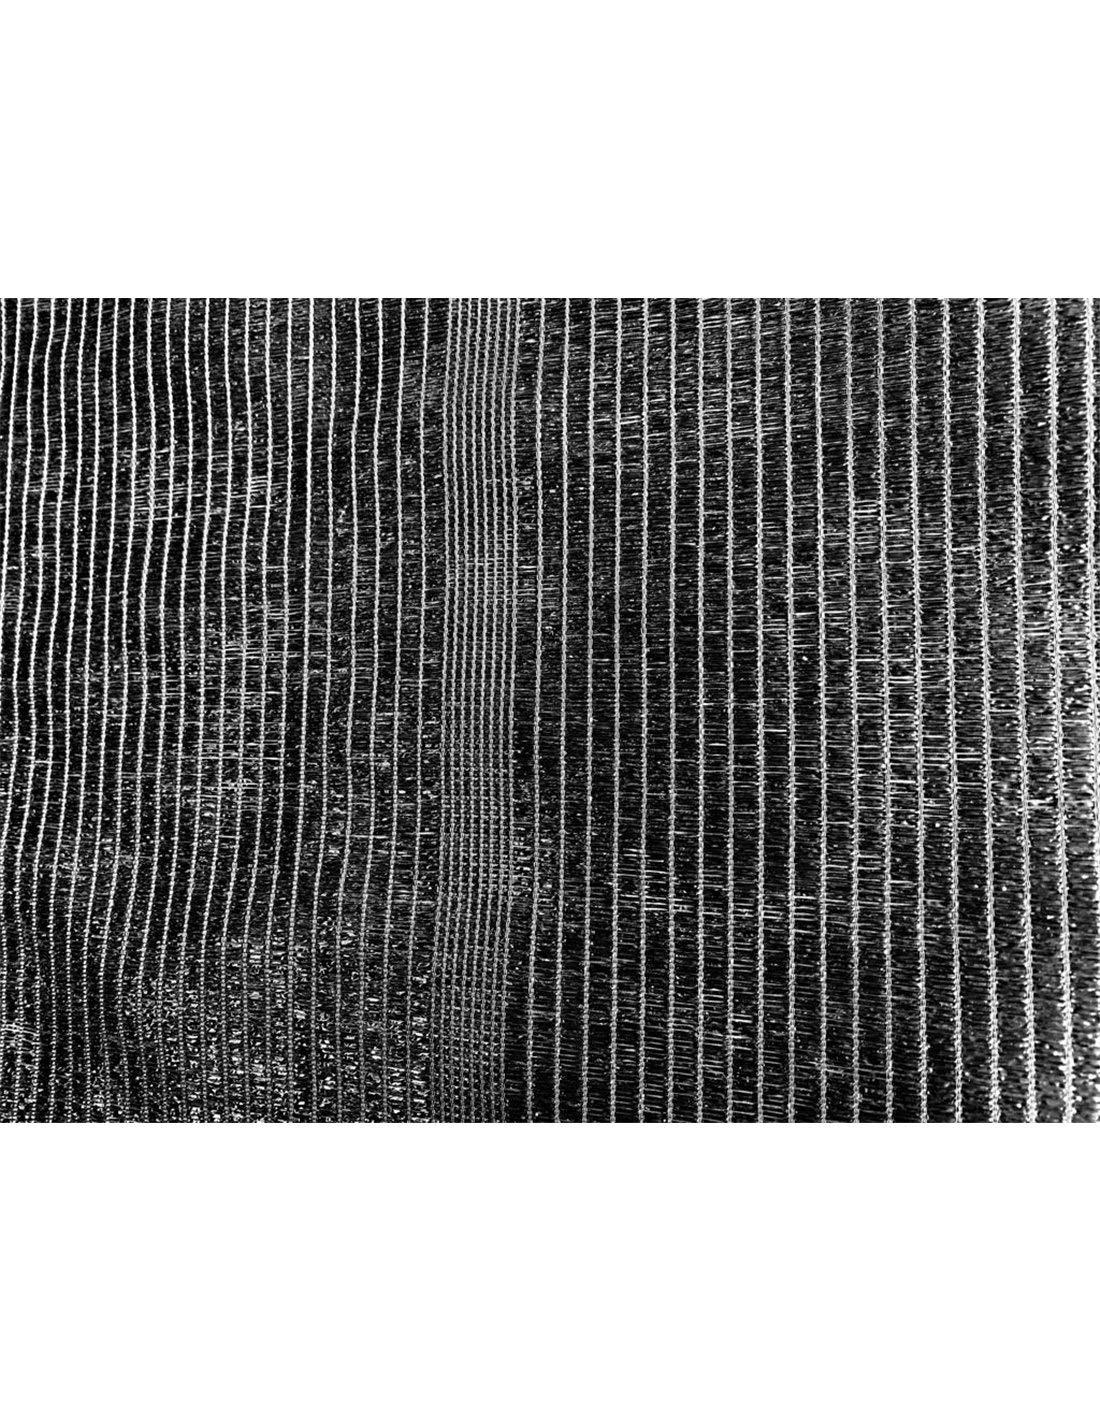 Jardin202 1 m. de Ancho - Malla de Ocultacion Negra - Metro Lineal ...